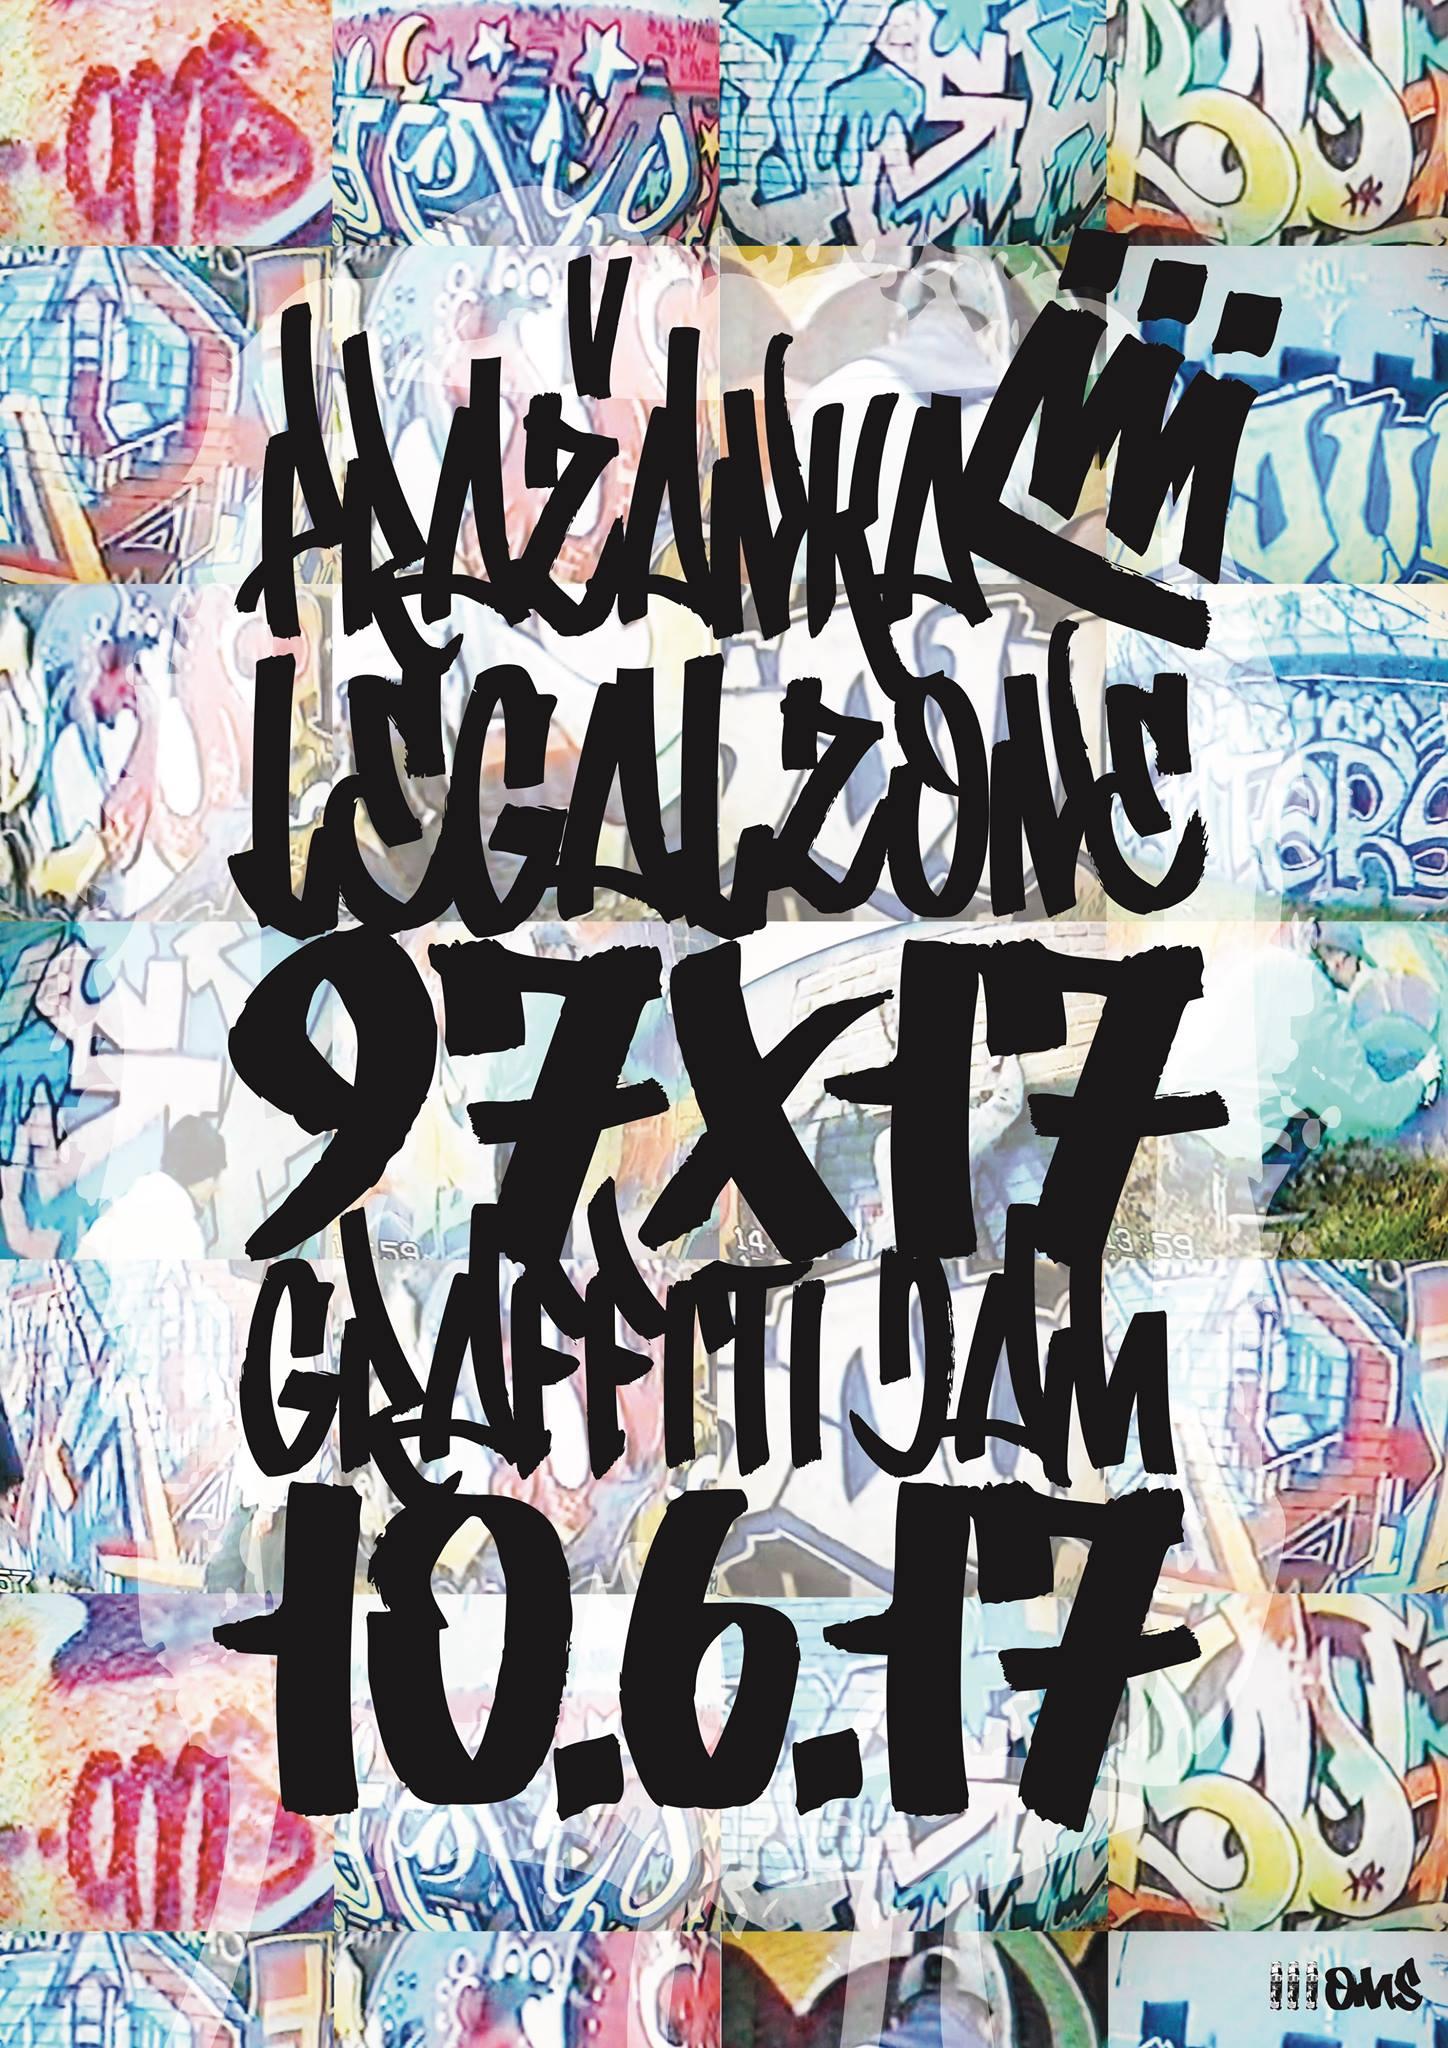 Pražanka 97X17 Graffiti Jam - Kladno